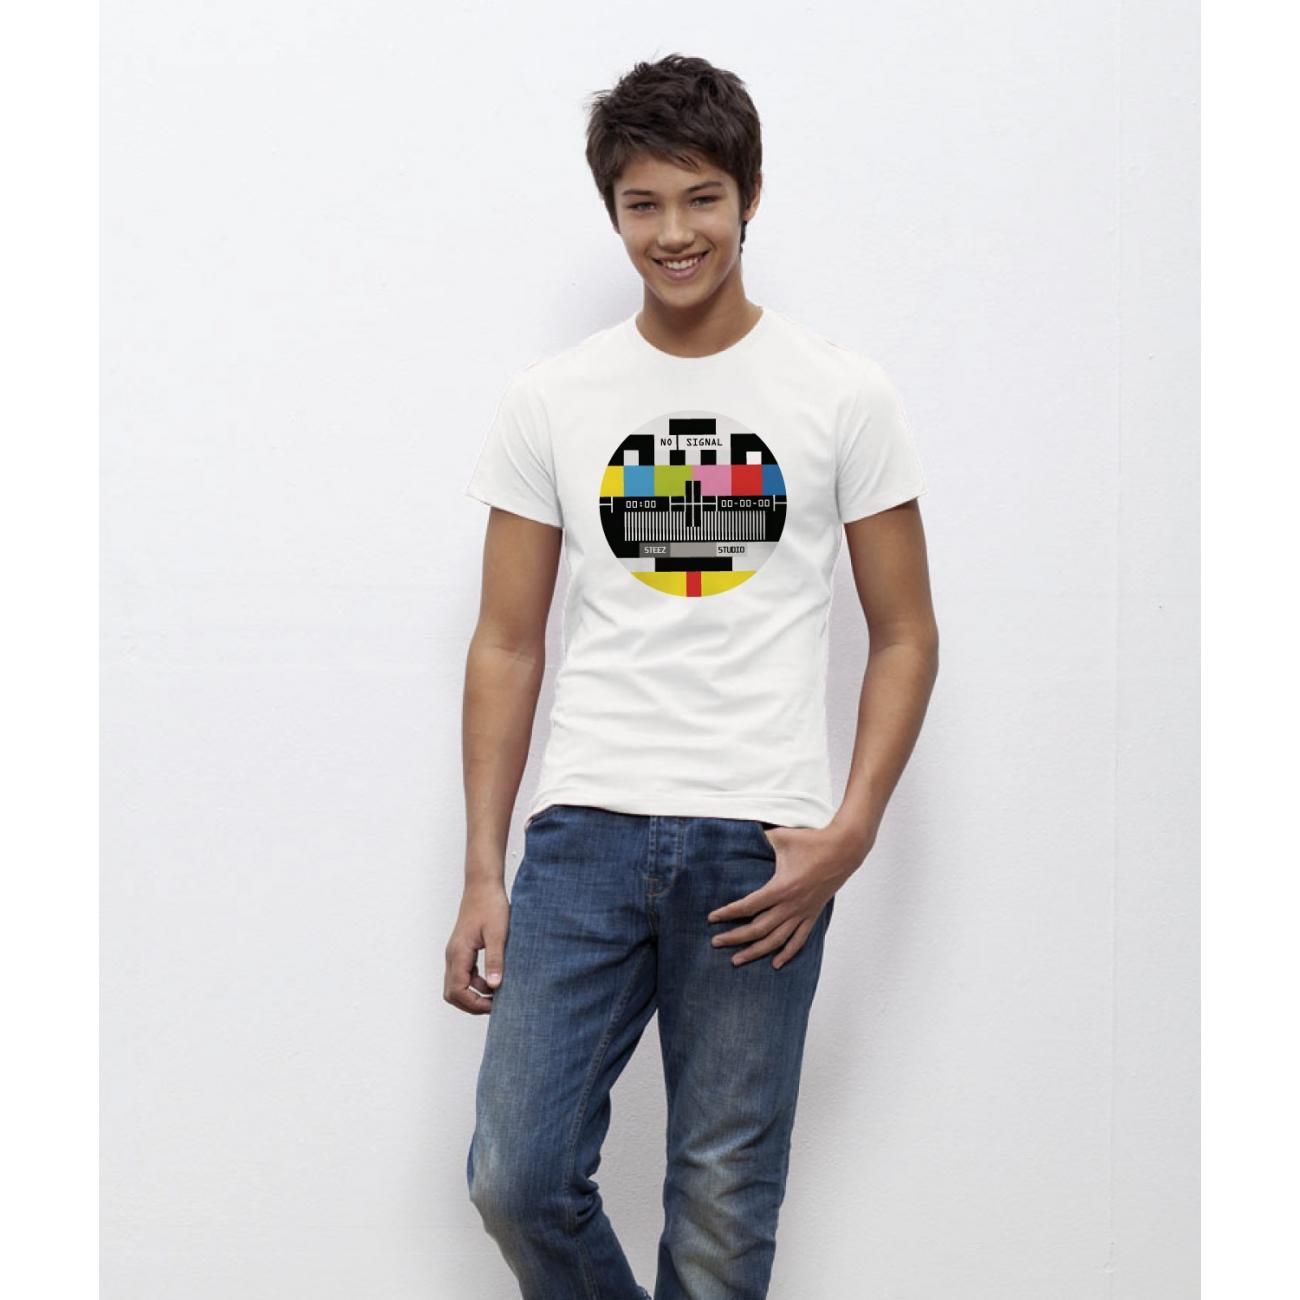 https://tee-shirt-bio.com/6197-thickbox_default/tee-shirt-coton-bio-blanc-pour-homme-impression-la-mire.jpg